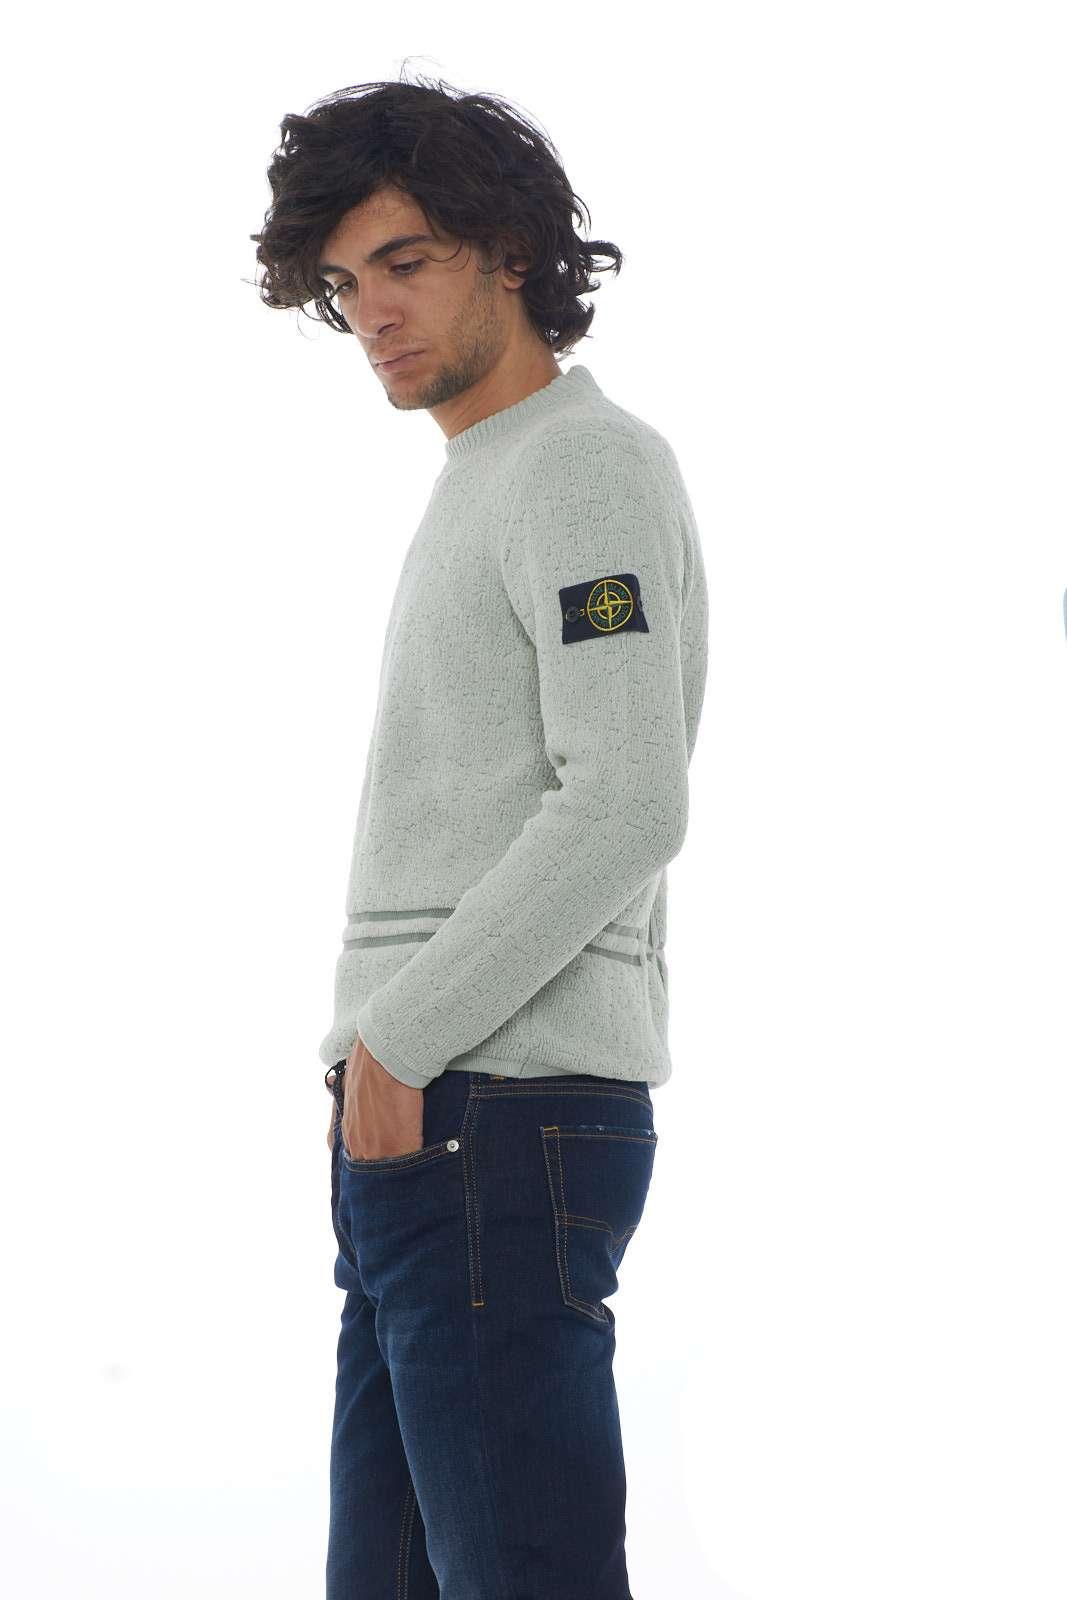 https://www.parmax.com/media/catalog/product/a/i/AI-outlet_parmax-maglia-uomo-Stone-Island-7115517B1-B.jpg